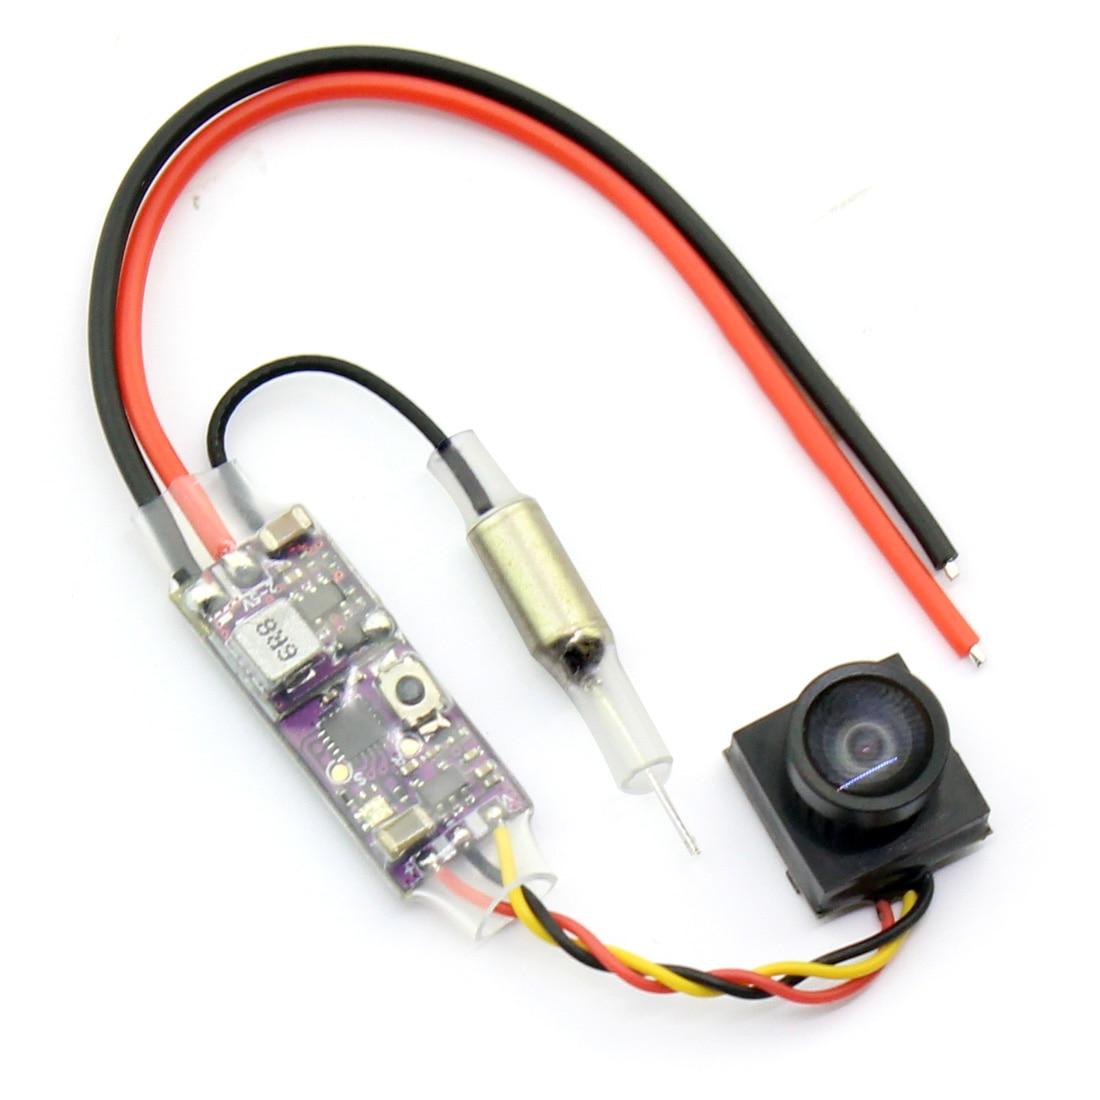 Q25 MINI V2 VTX+CAMERA 25mw 16ch Transmitter 800tvl coms Camera for 90GT Super Mini FPV Drone F19938